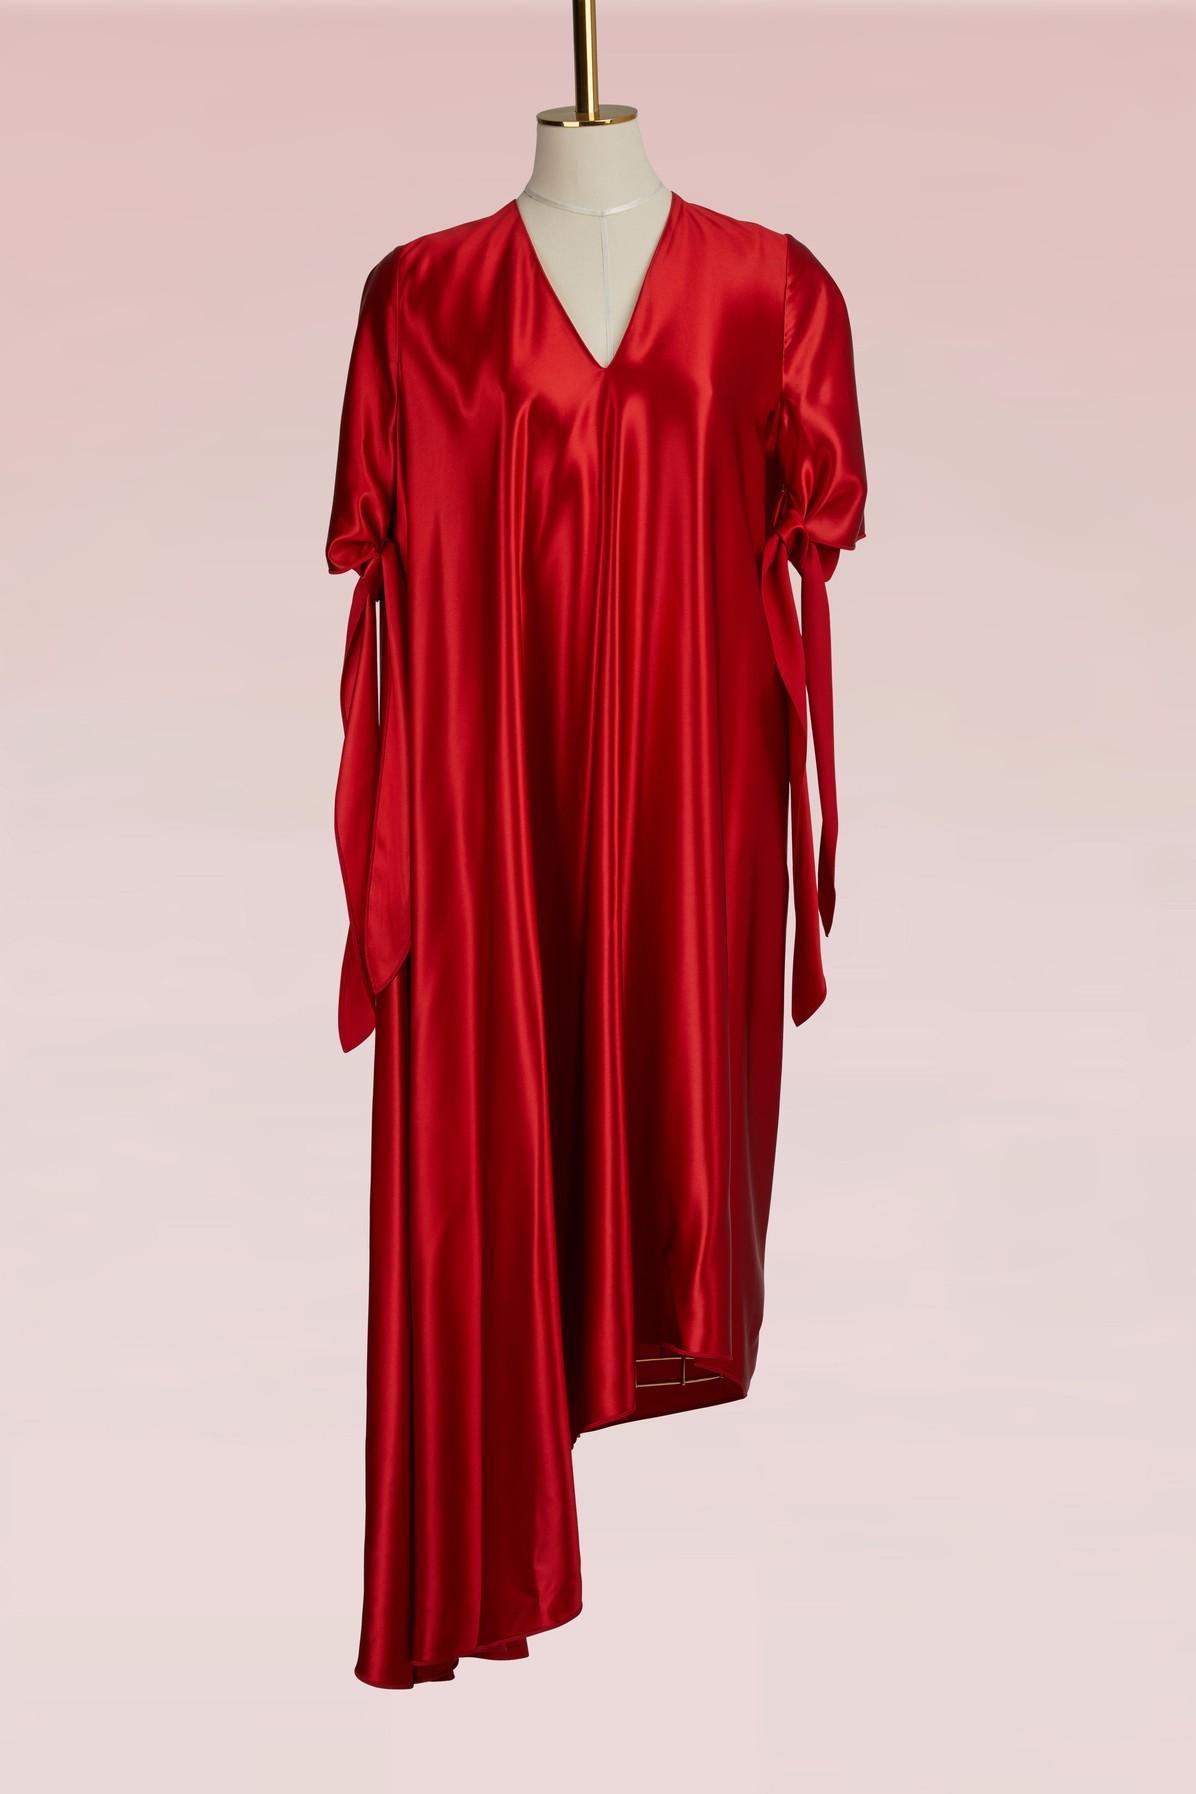 Maison Margiela Midi-length Fluid Dress In Flame